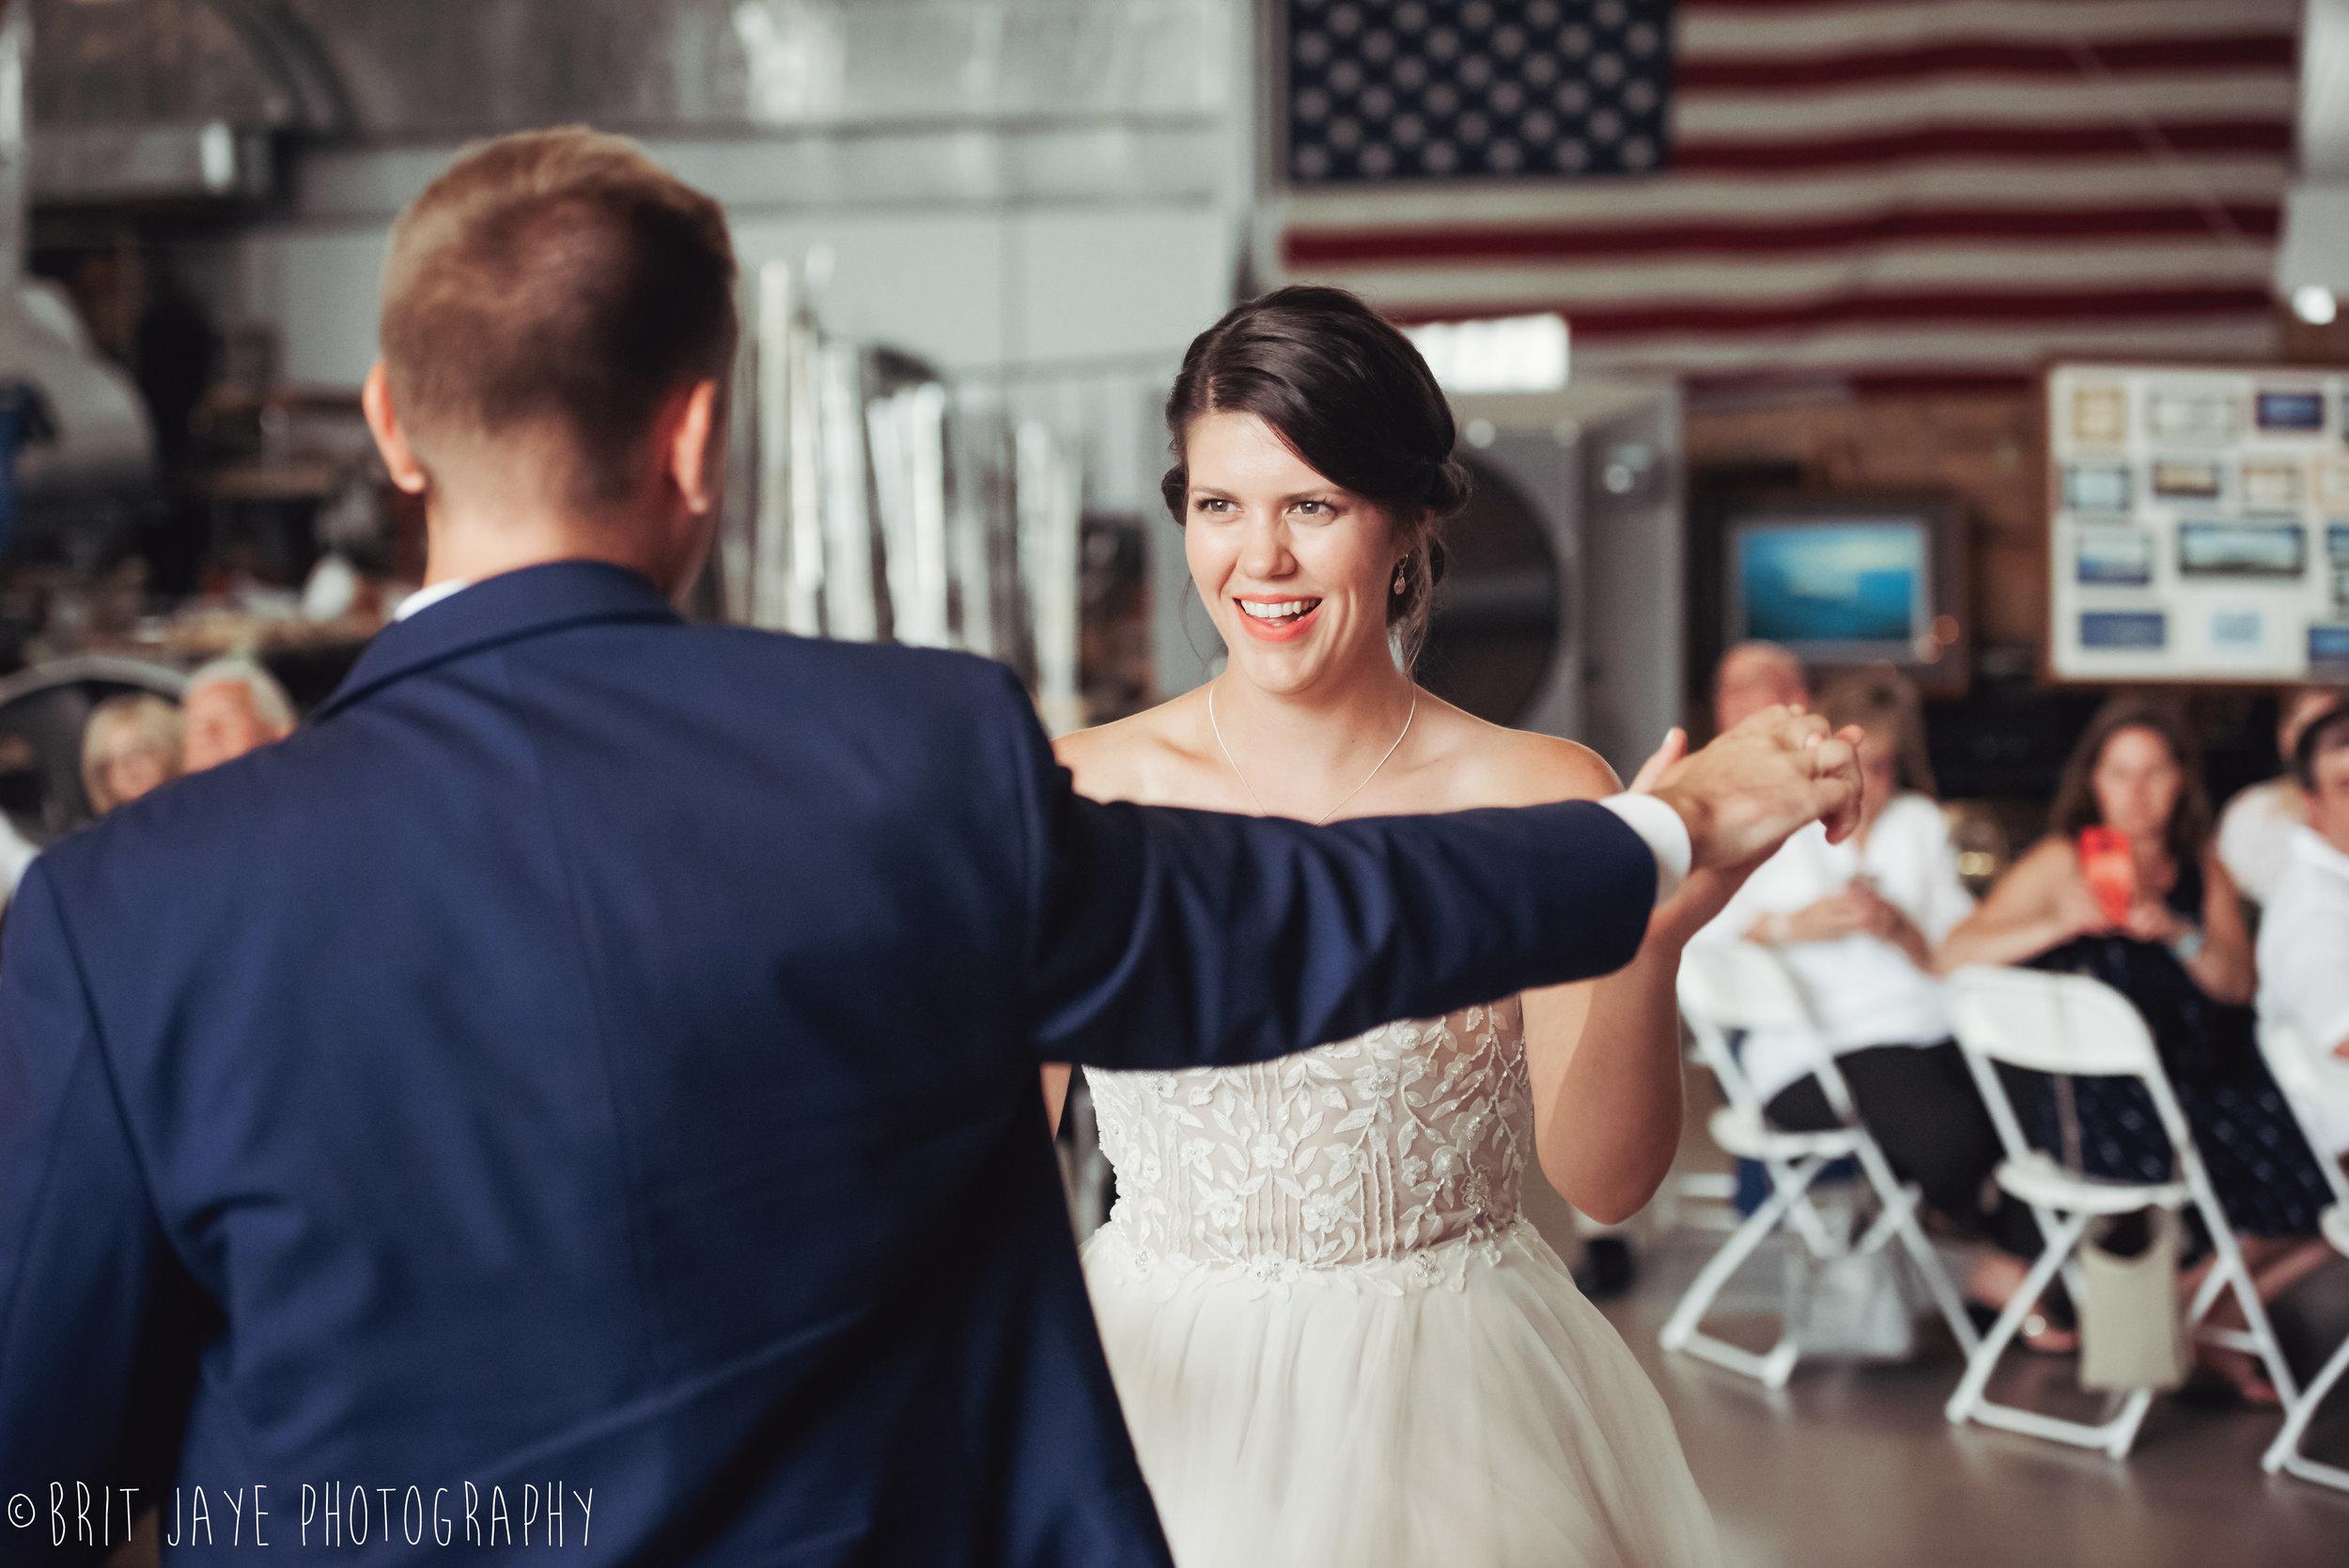 Champaign_aviation_museum_travel_inspired_wedding-79.jpg